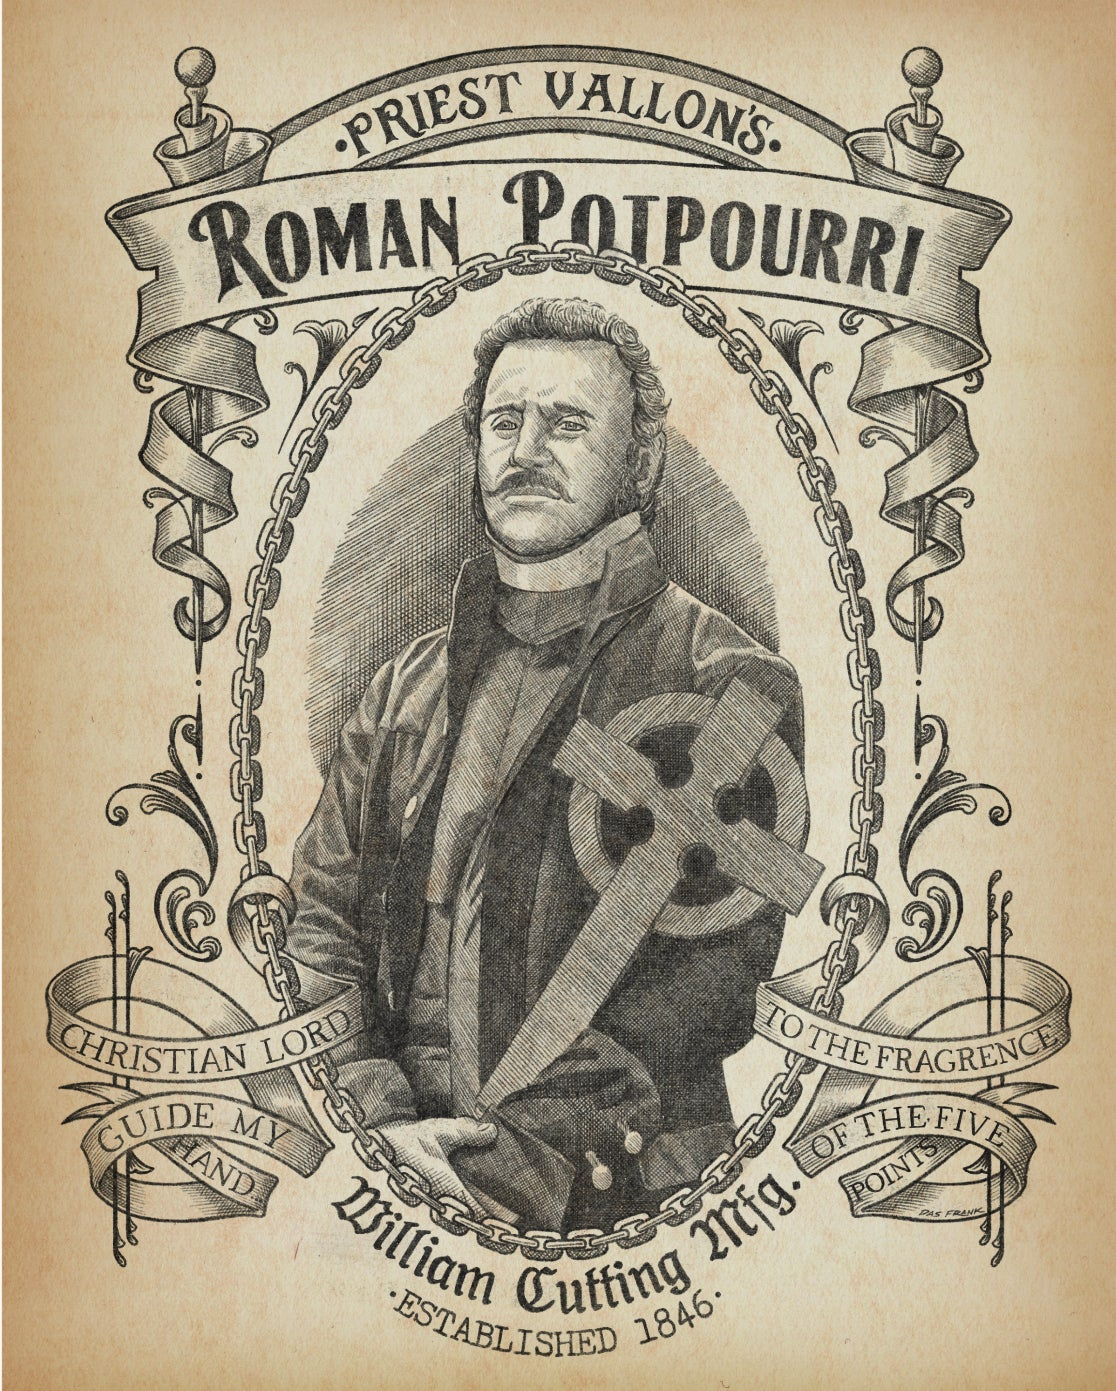 Roman Potpourri